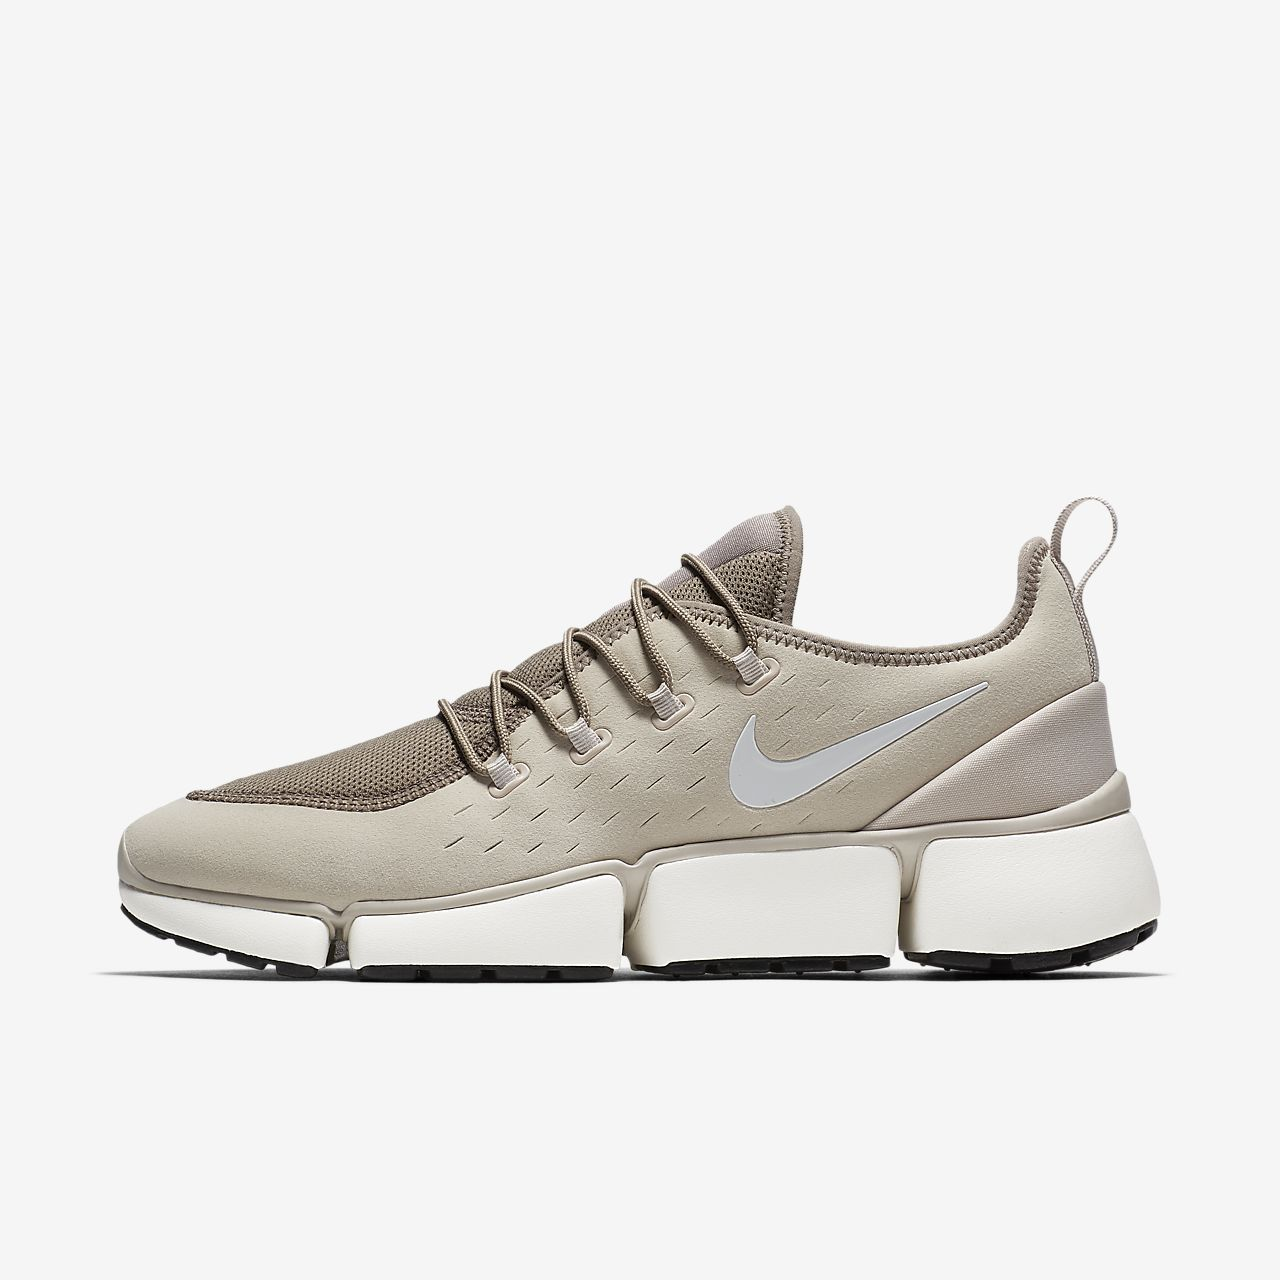 Nike Sportswear POCKET FLY - Trainers - desert sand/white/sepia stone/sail/black 4l1VjBTjQ